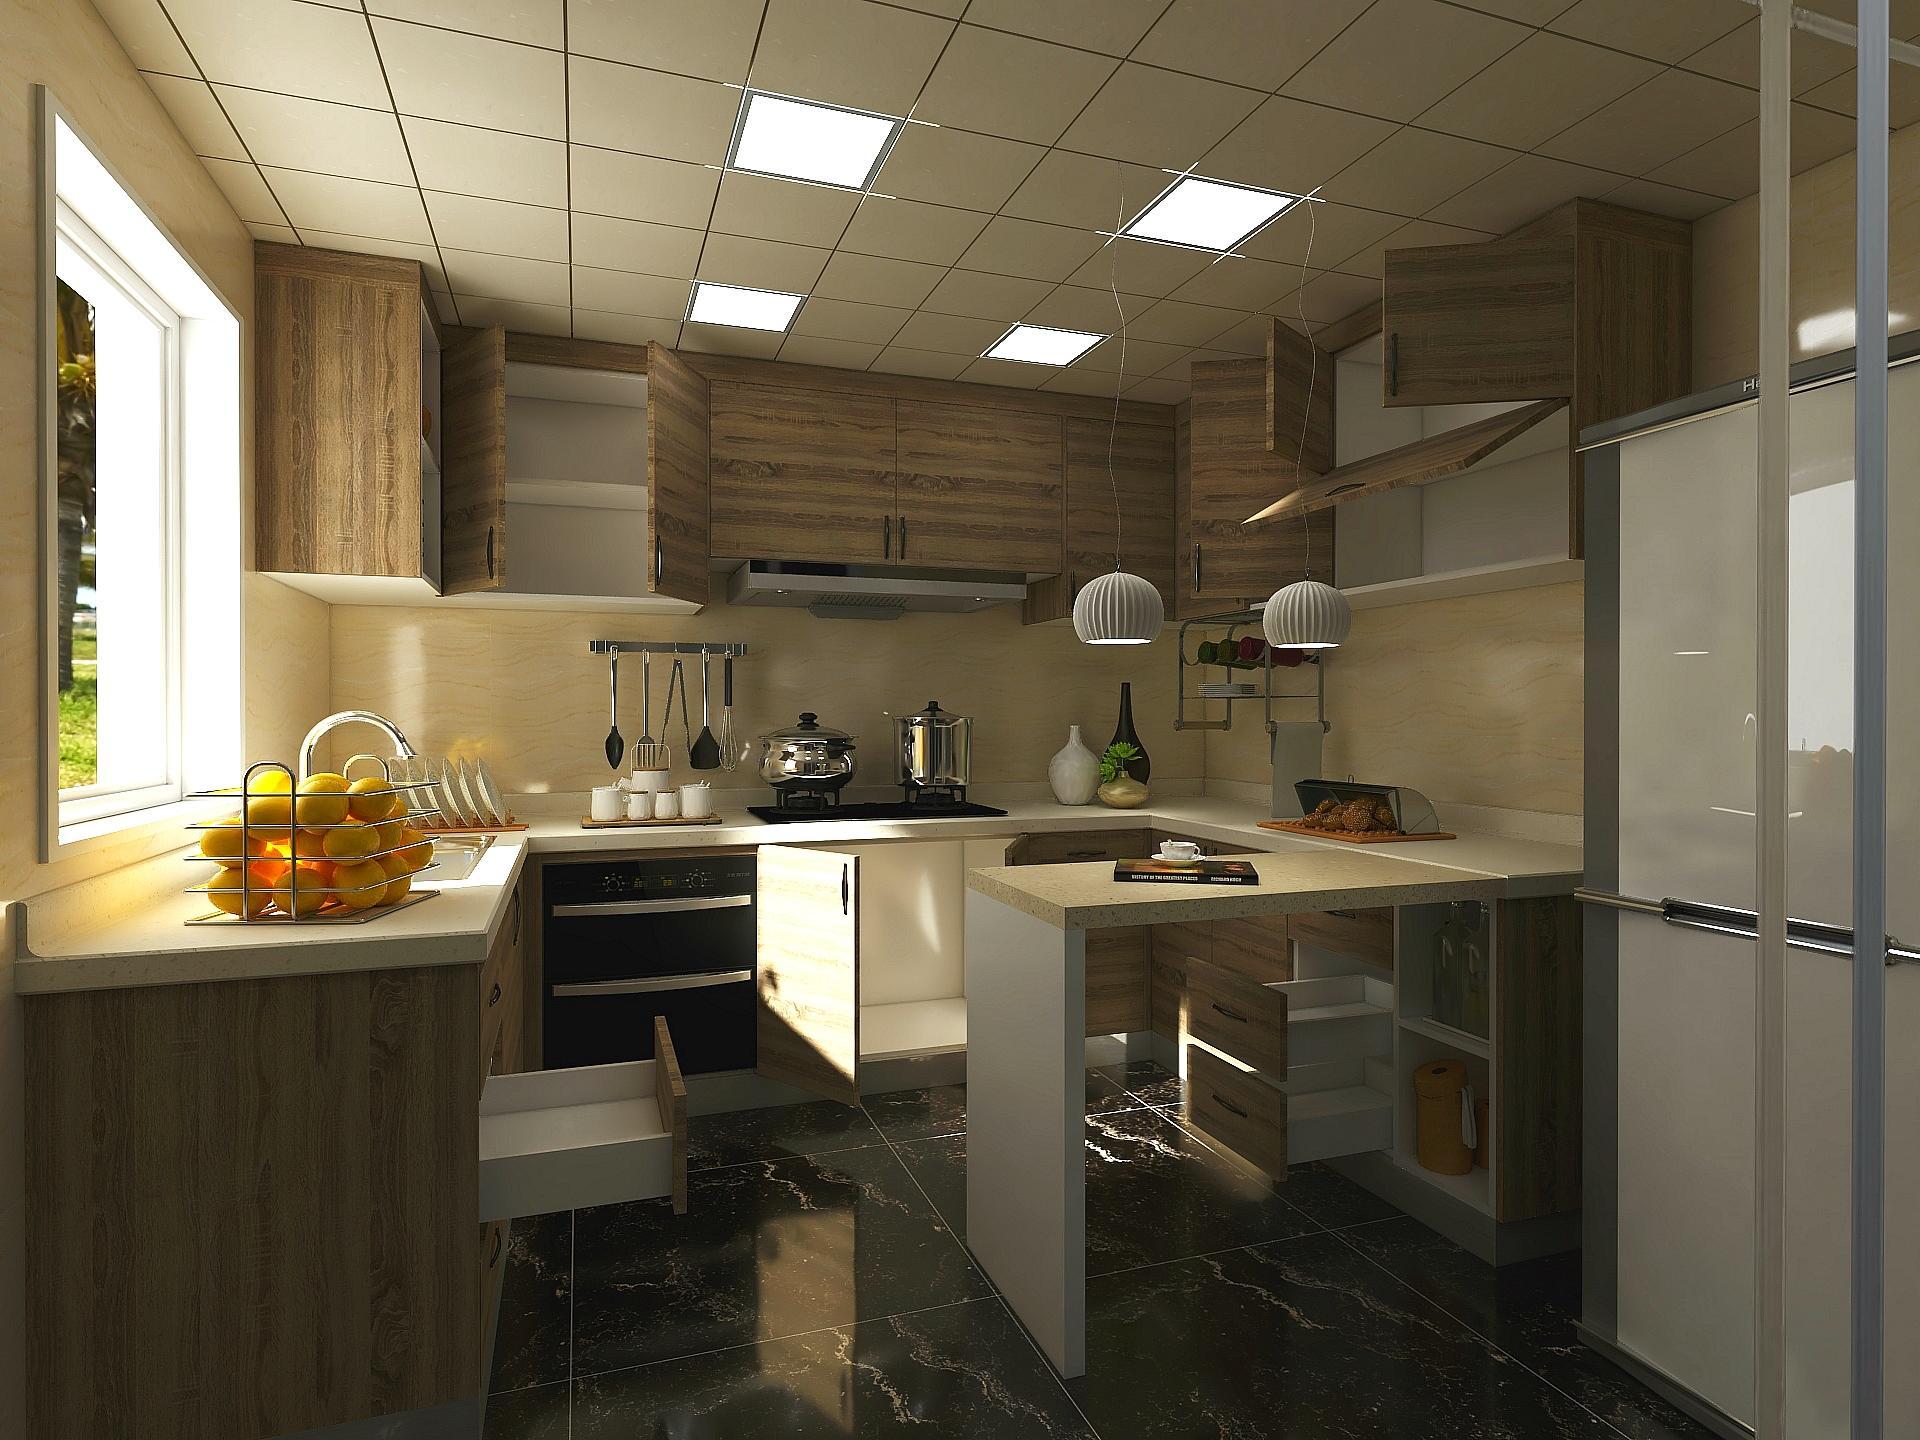 Programa de diseño de cocinas 3D Aihouse con puertas abiertas